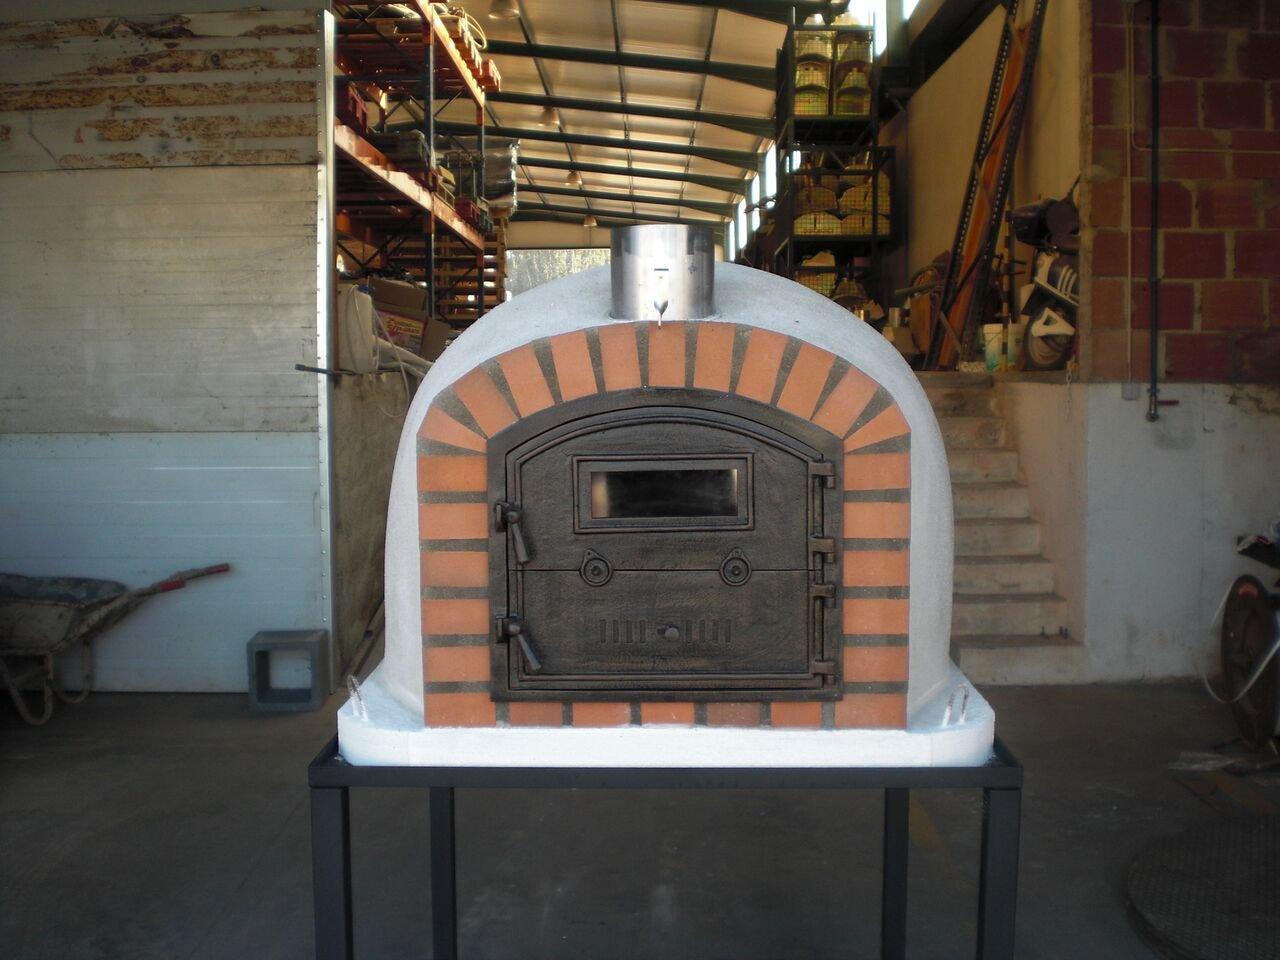 Horno de pizza de ladrillo, aislado, madera Fired, fabricada en Portugal, ladrillo o Piedra Face: Amazon.es: Jardín